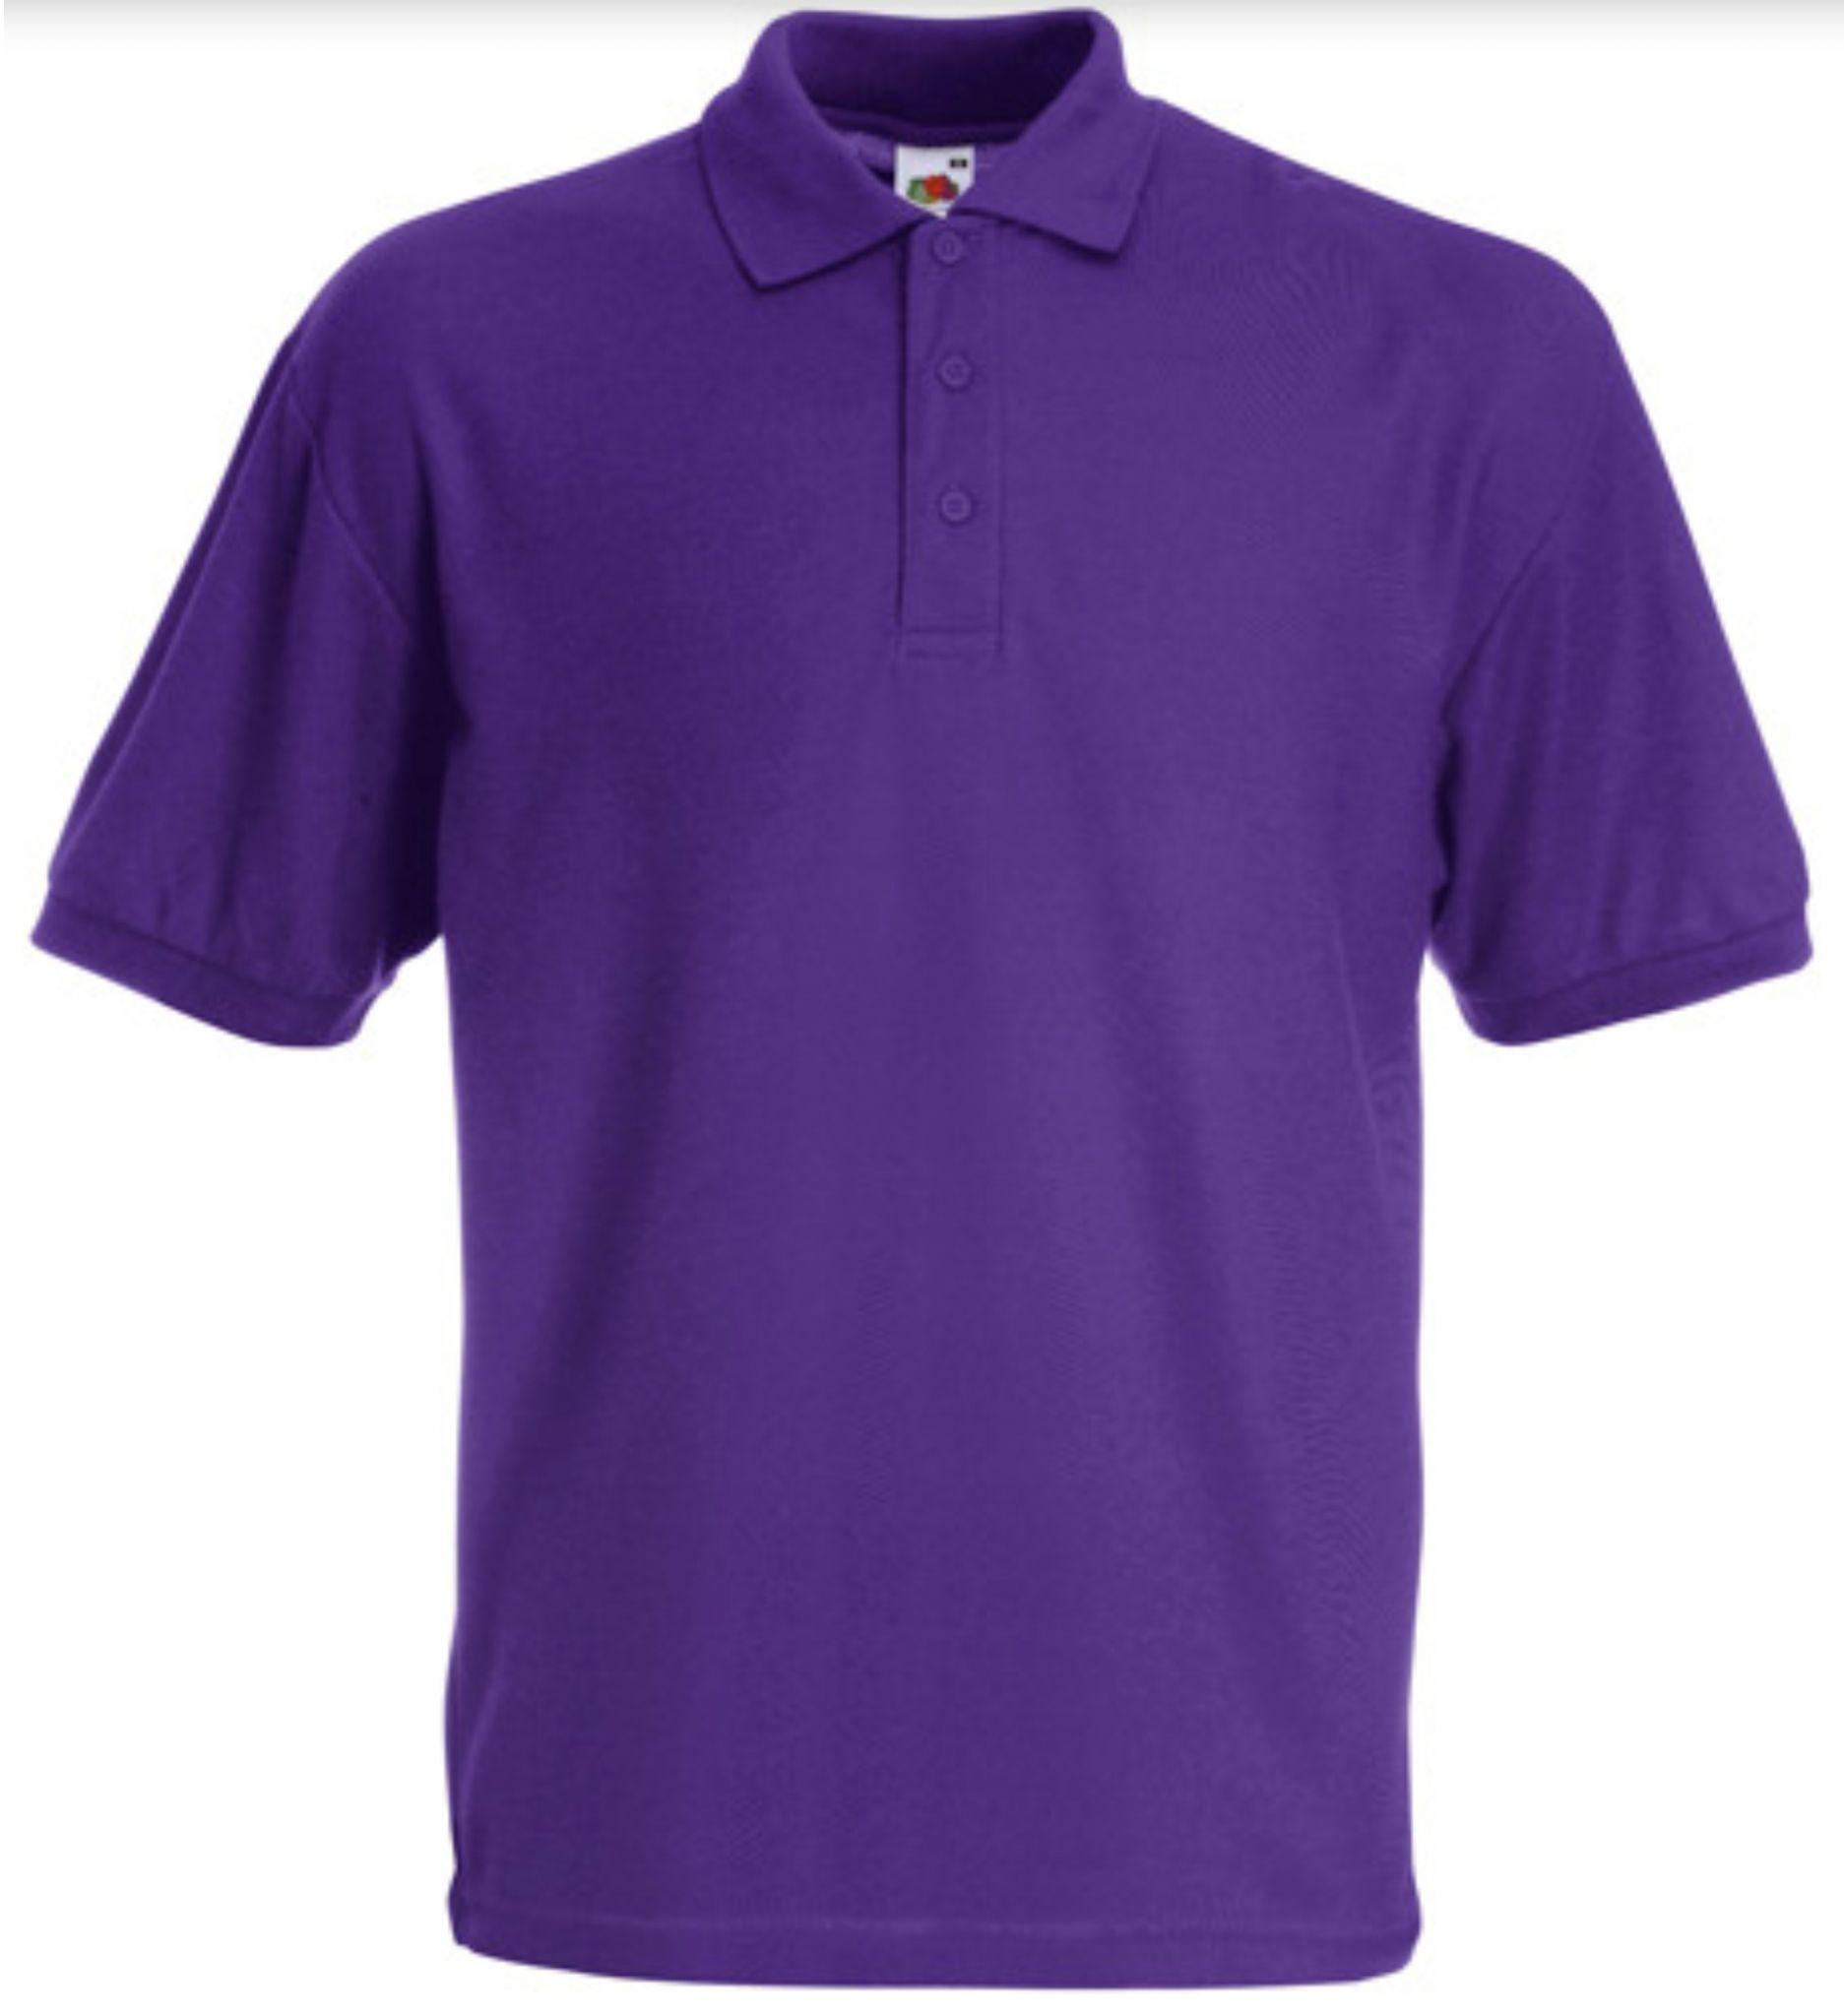 fb7f876ea St Michaels Polo Shirt - Staff | KS Schoolwear